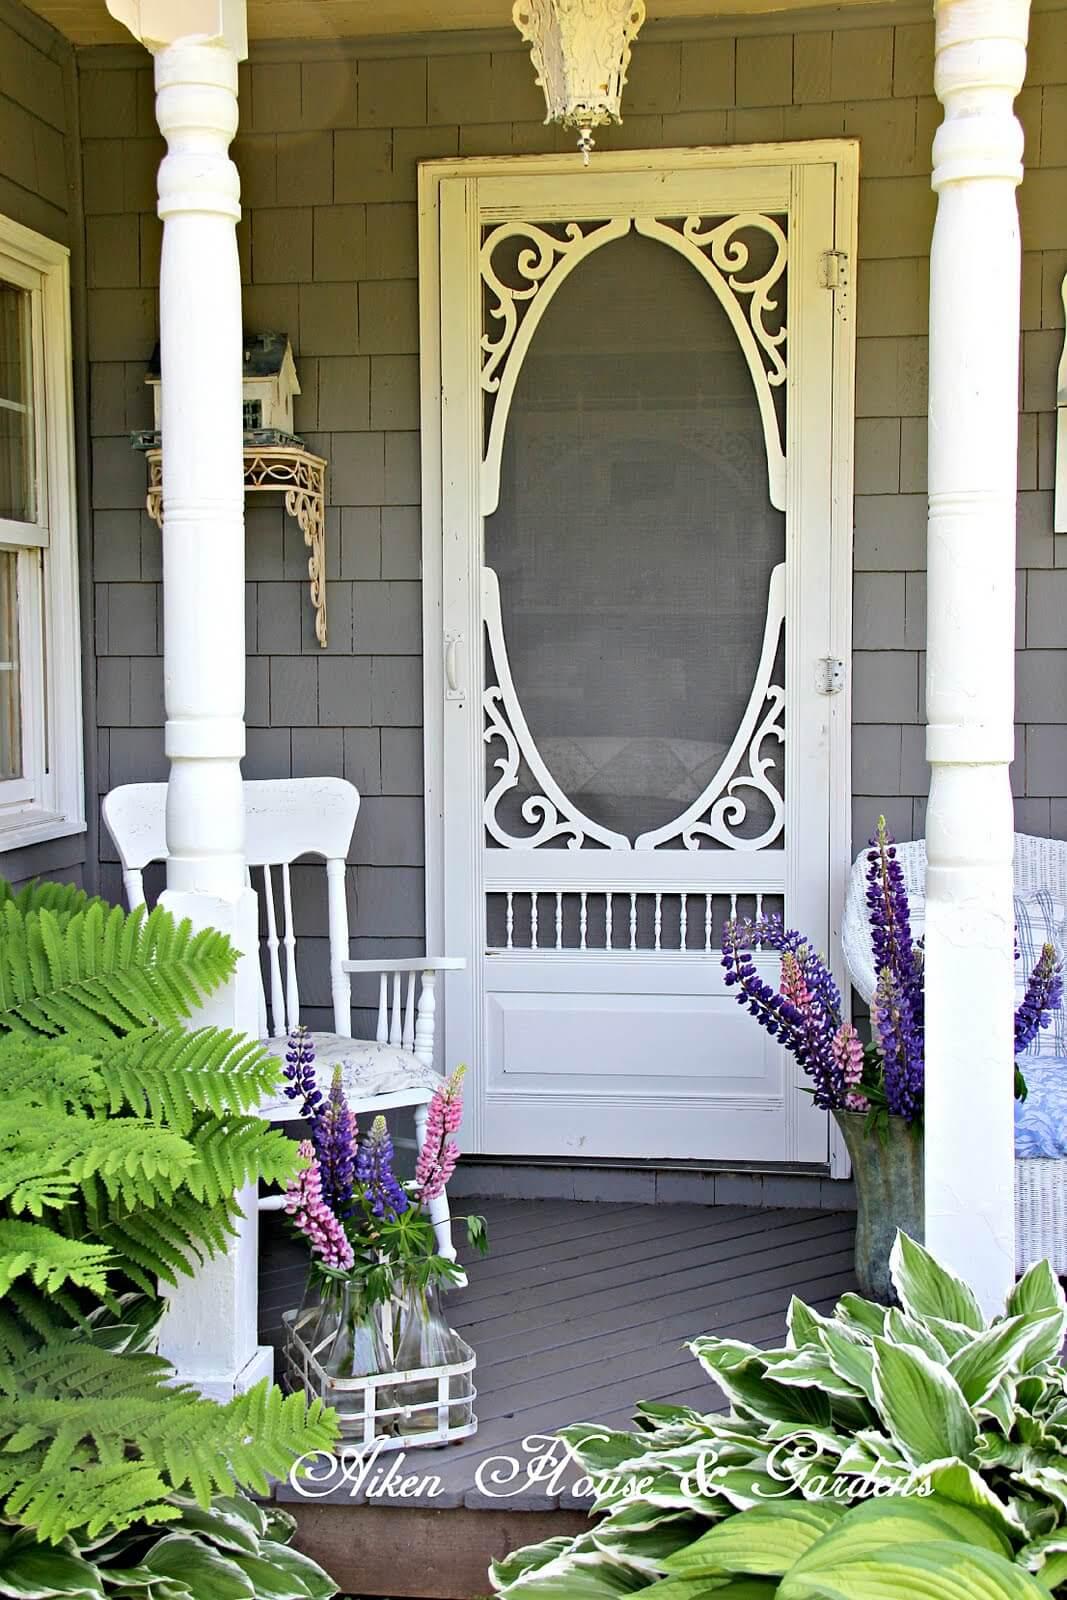 40 Best Vintage Porch Decor Ideas and Designs for 2019